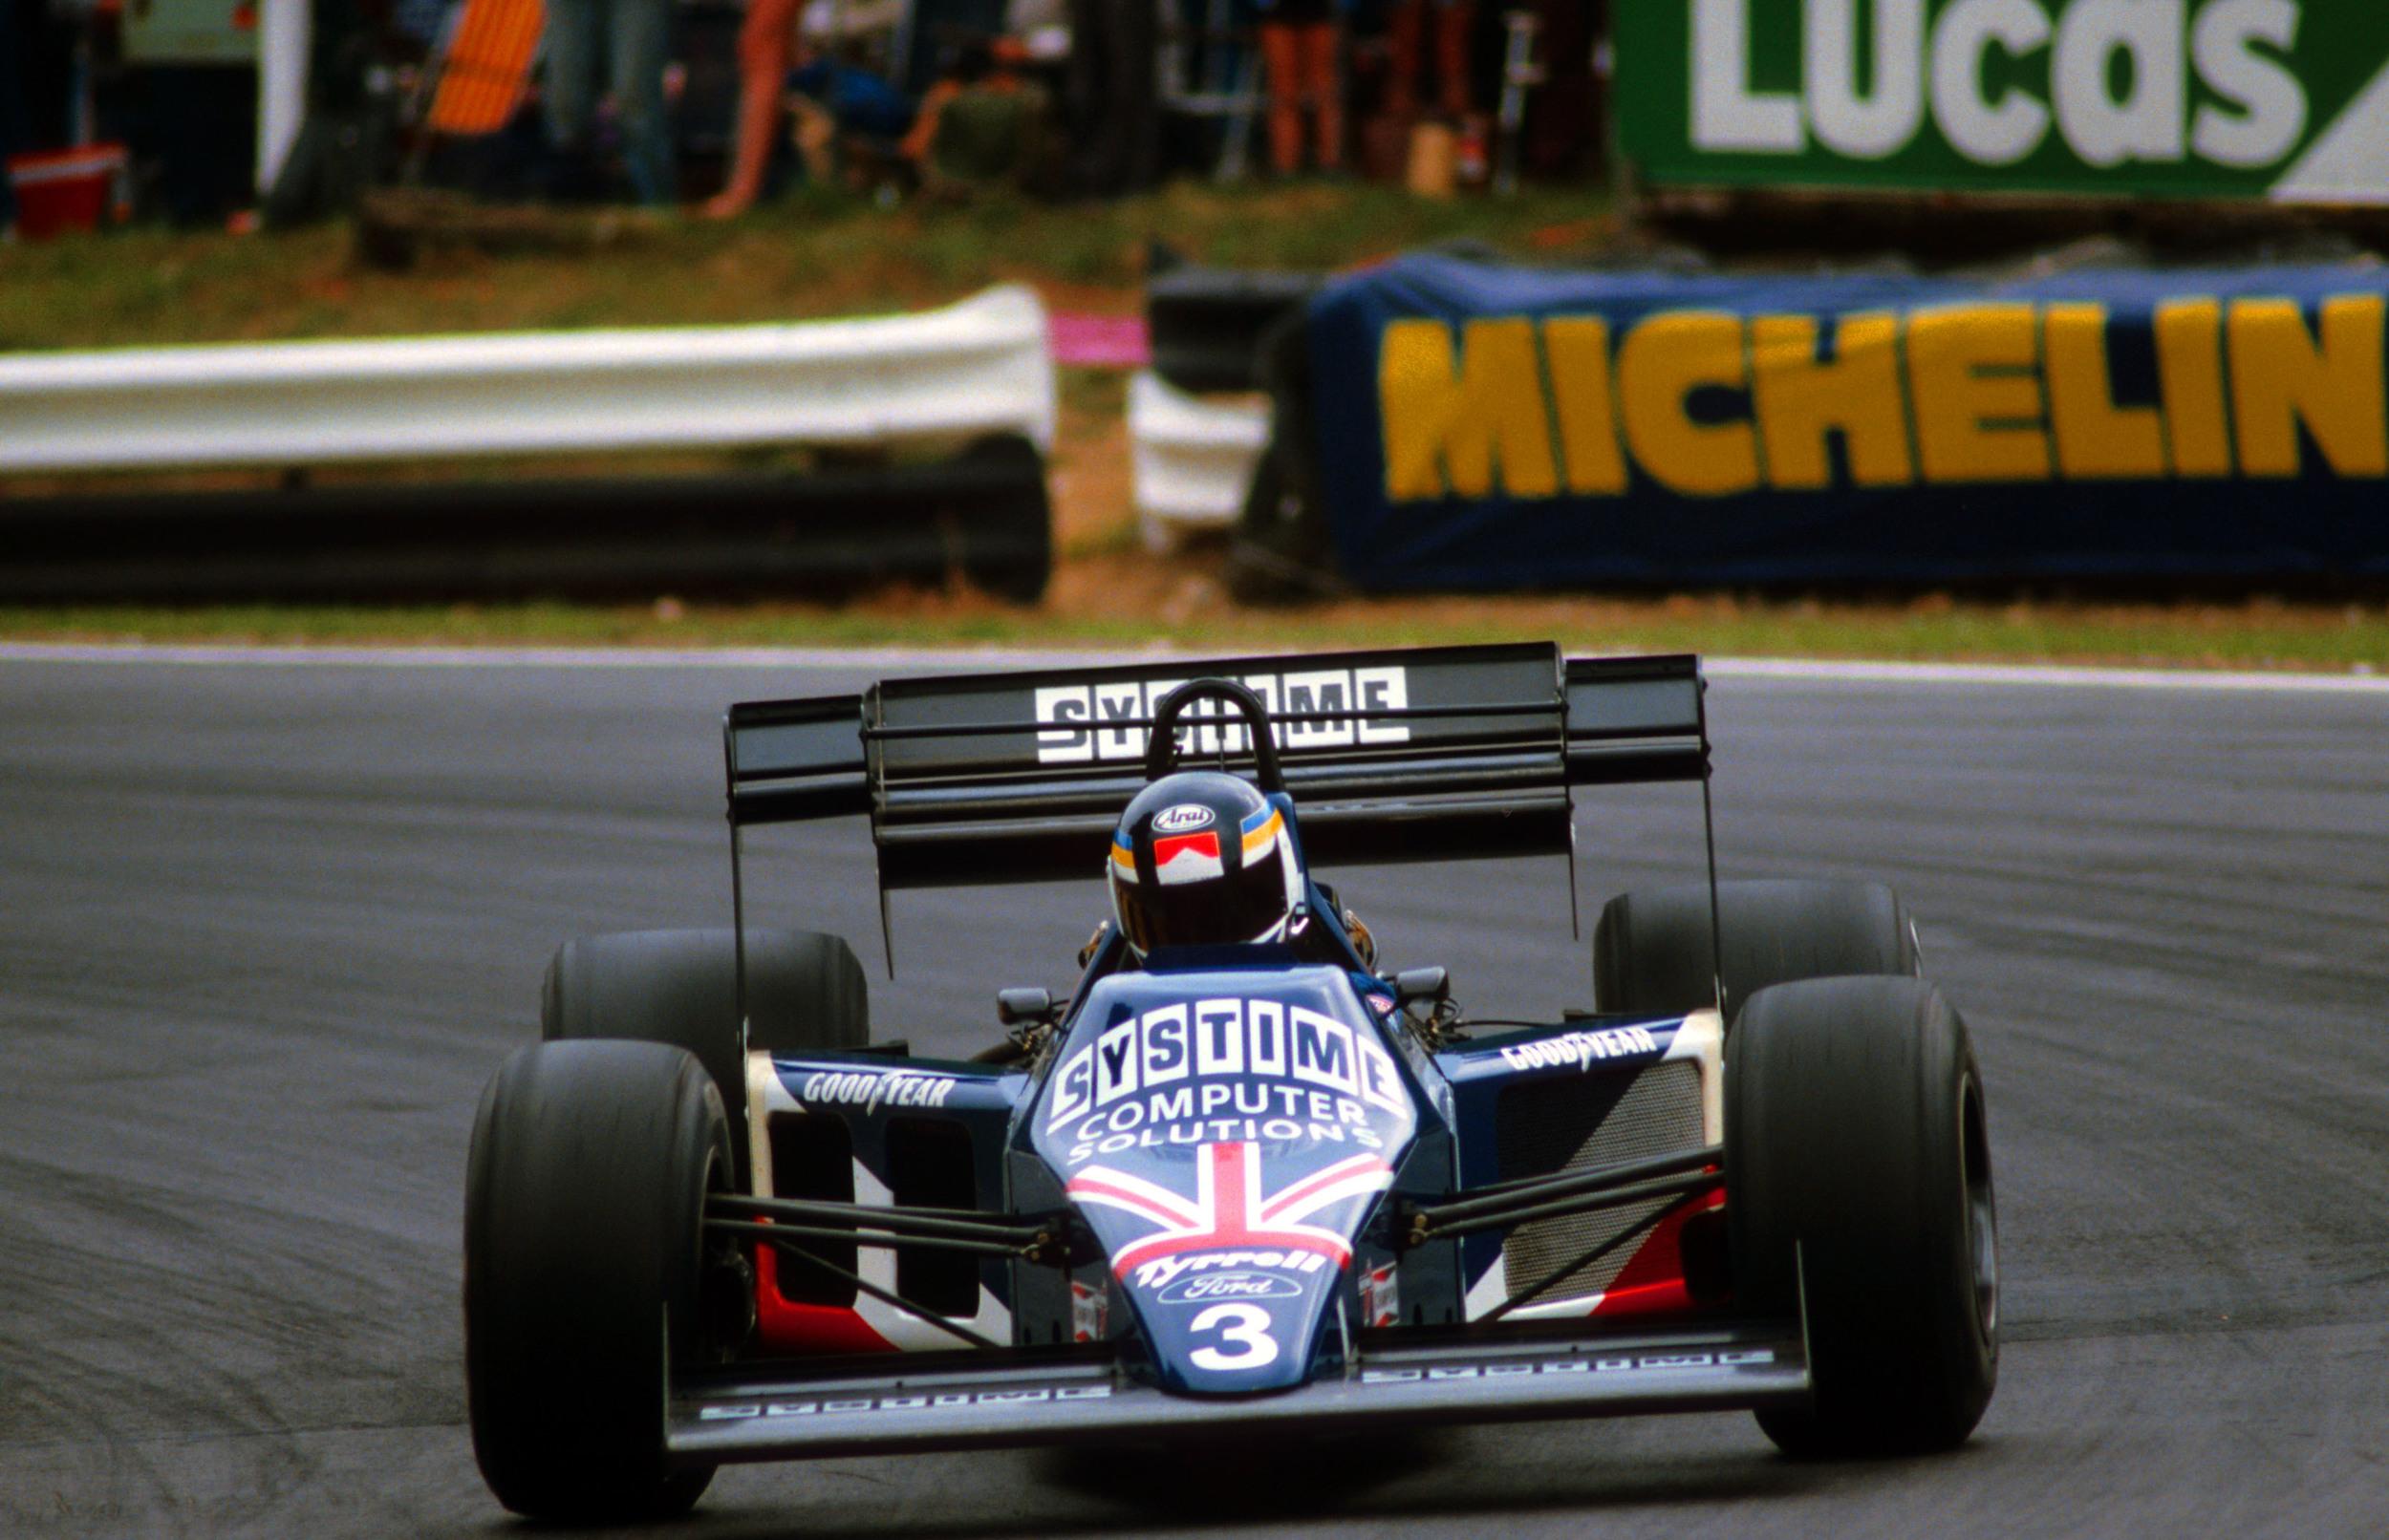 S JOHANSSON(Tyrell-1984)Brand-Hatch.jpg